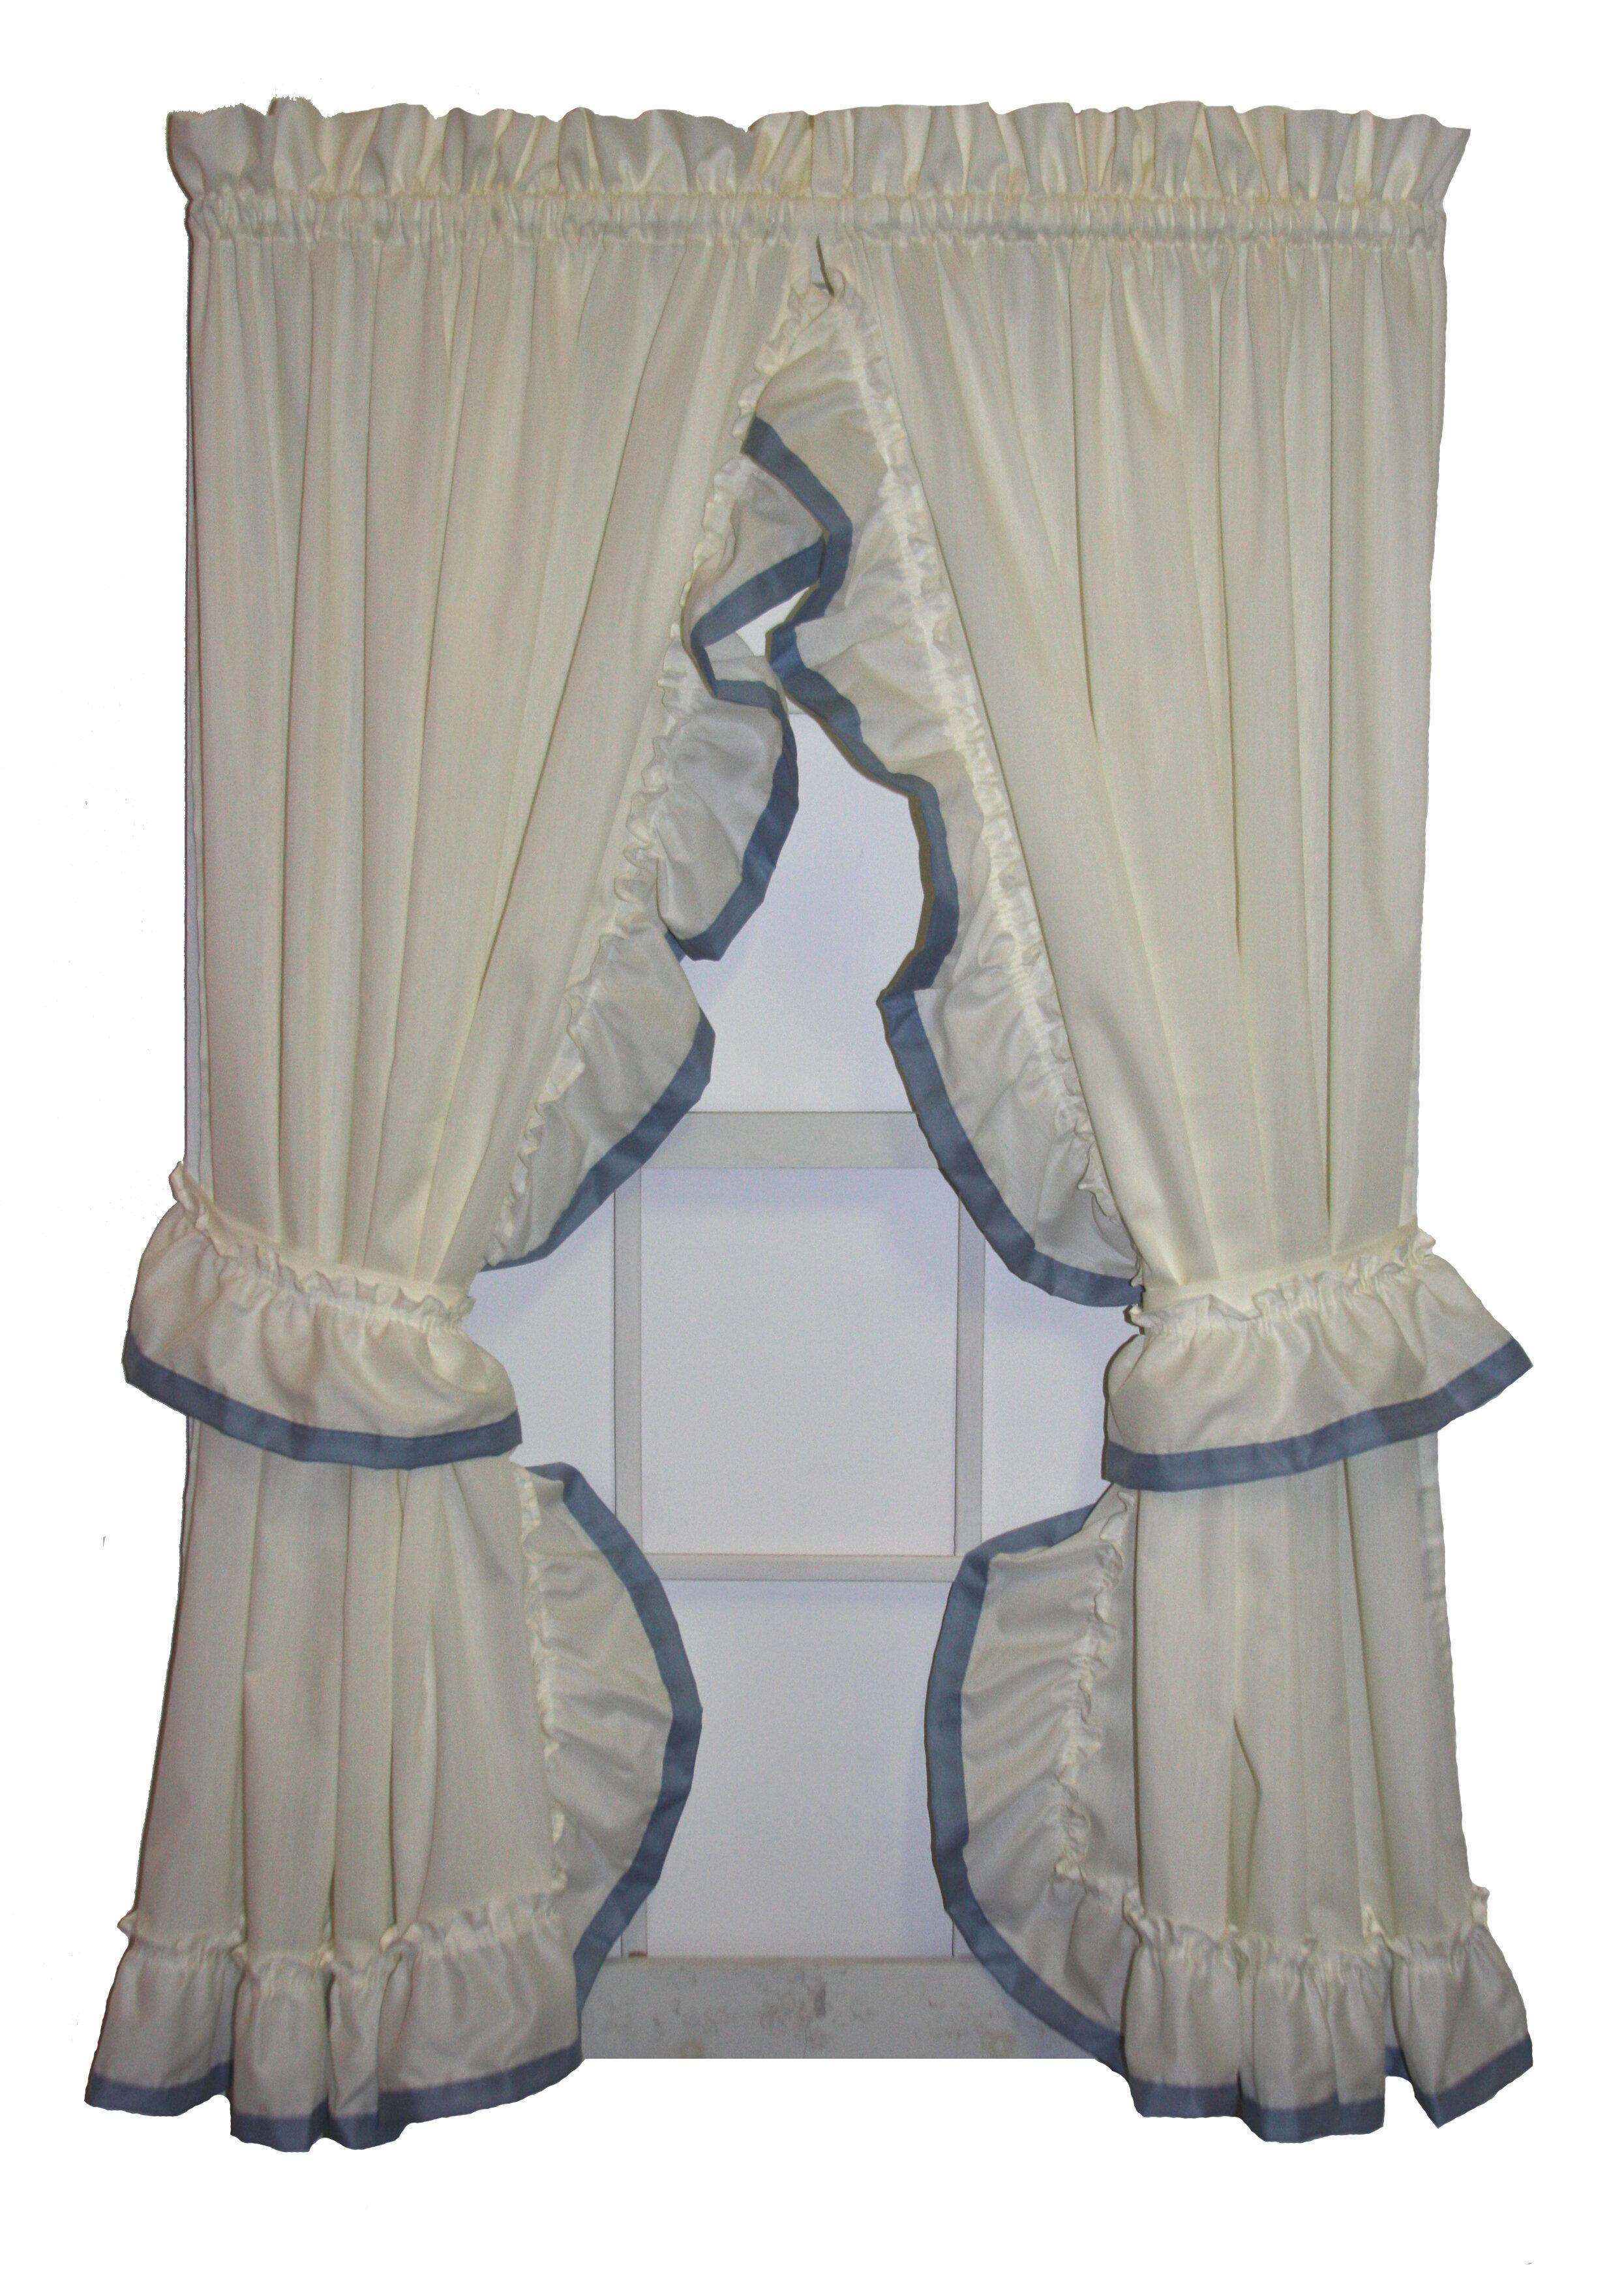 ordinary Priscilla Curtains Kitchen Part - 16: August Grove Howells Banded Edge Ruffled Priscilla Curtain Panels Pair |  Wayfair